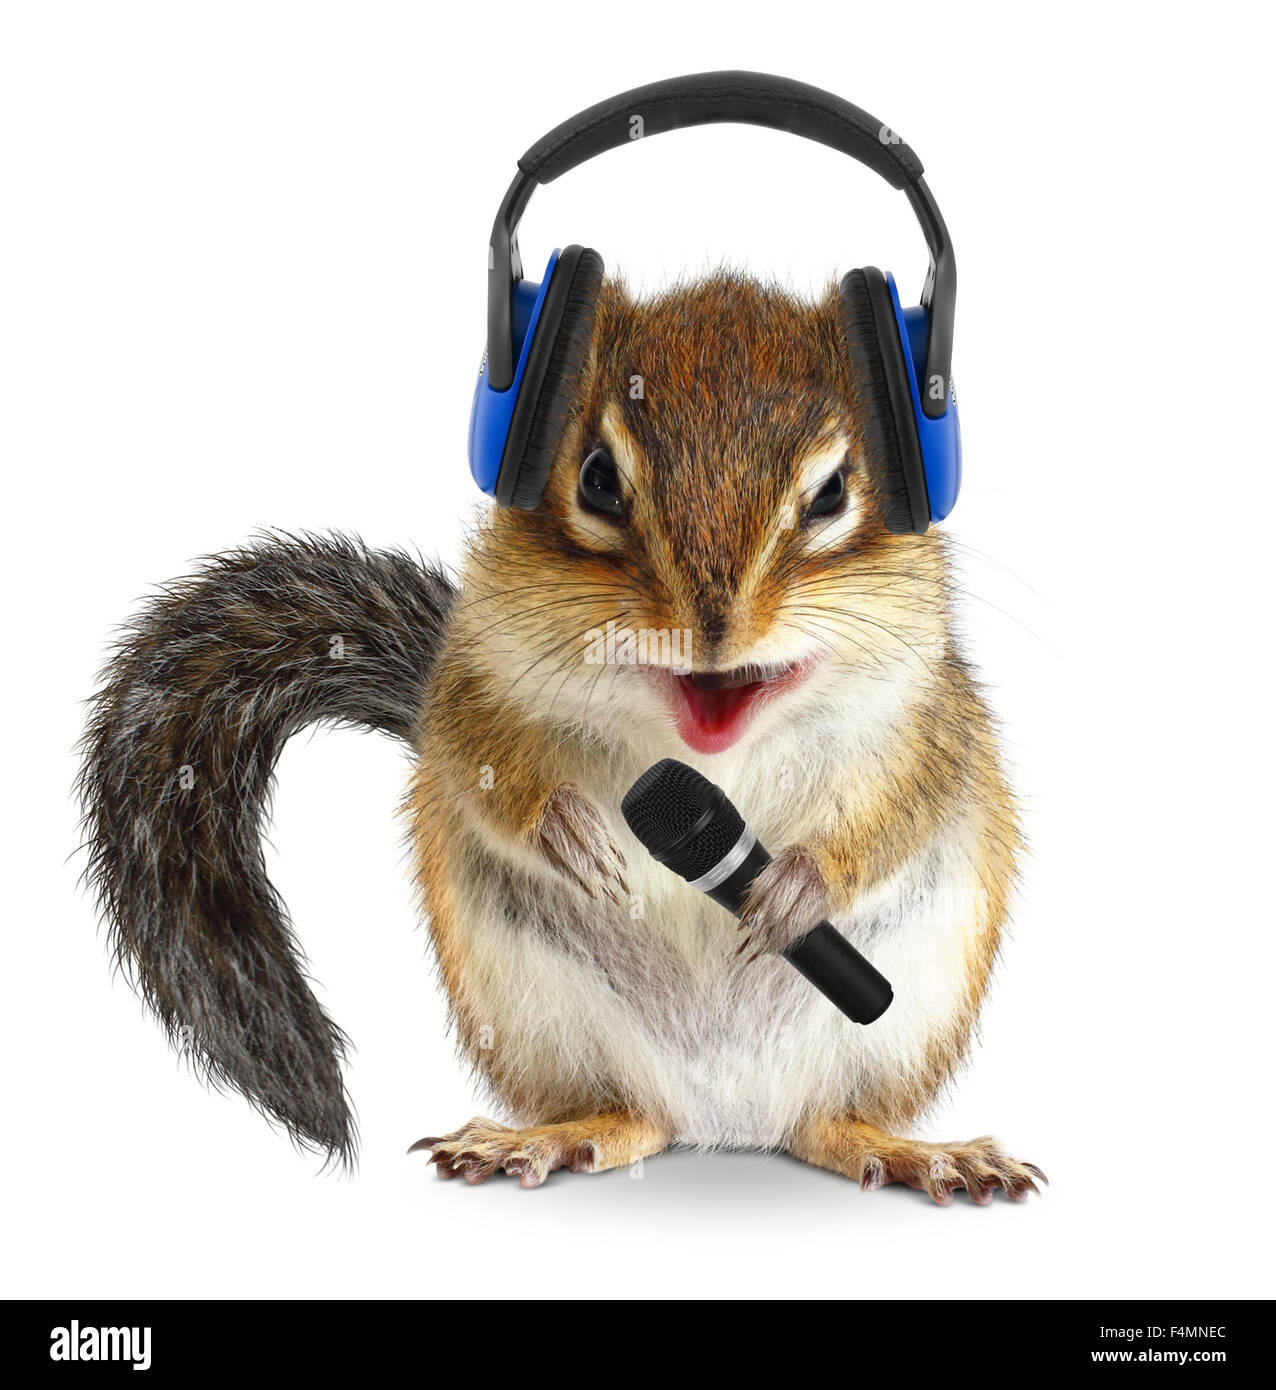 Funny chipmunk dj avec casque et microphone Photo Stock